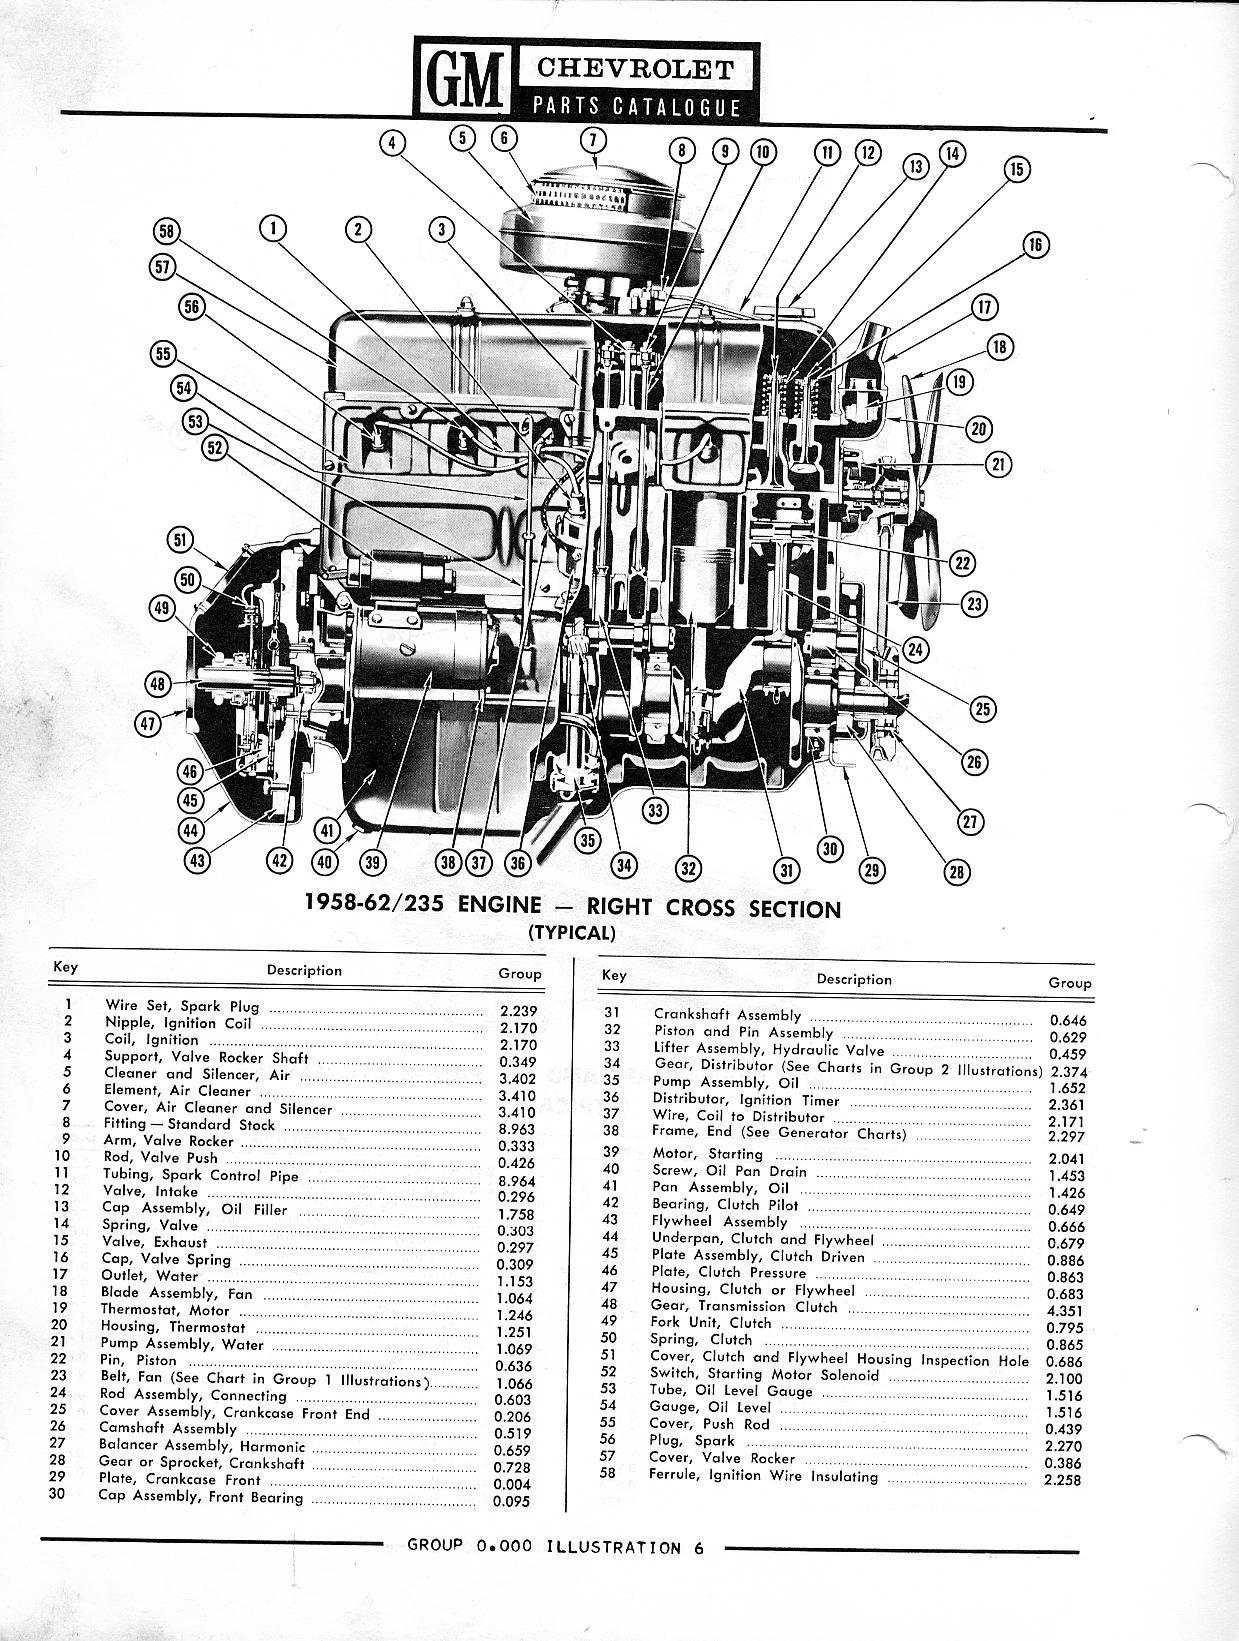 1958-1968 Chevrolet Parts Catalog / Image121.jpg